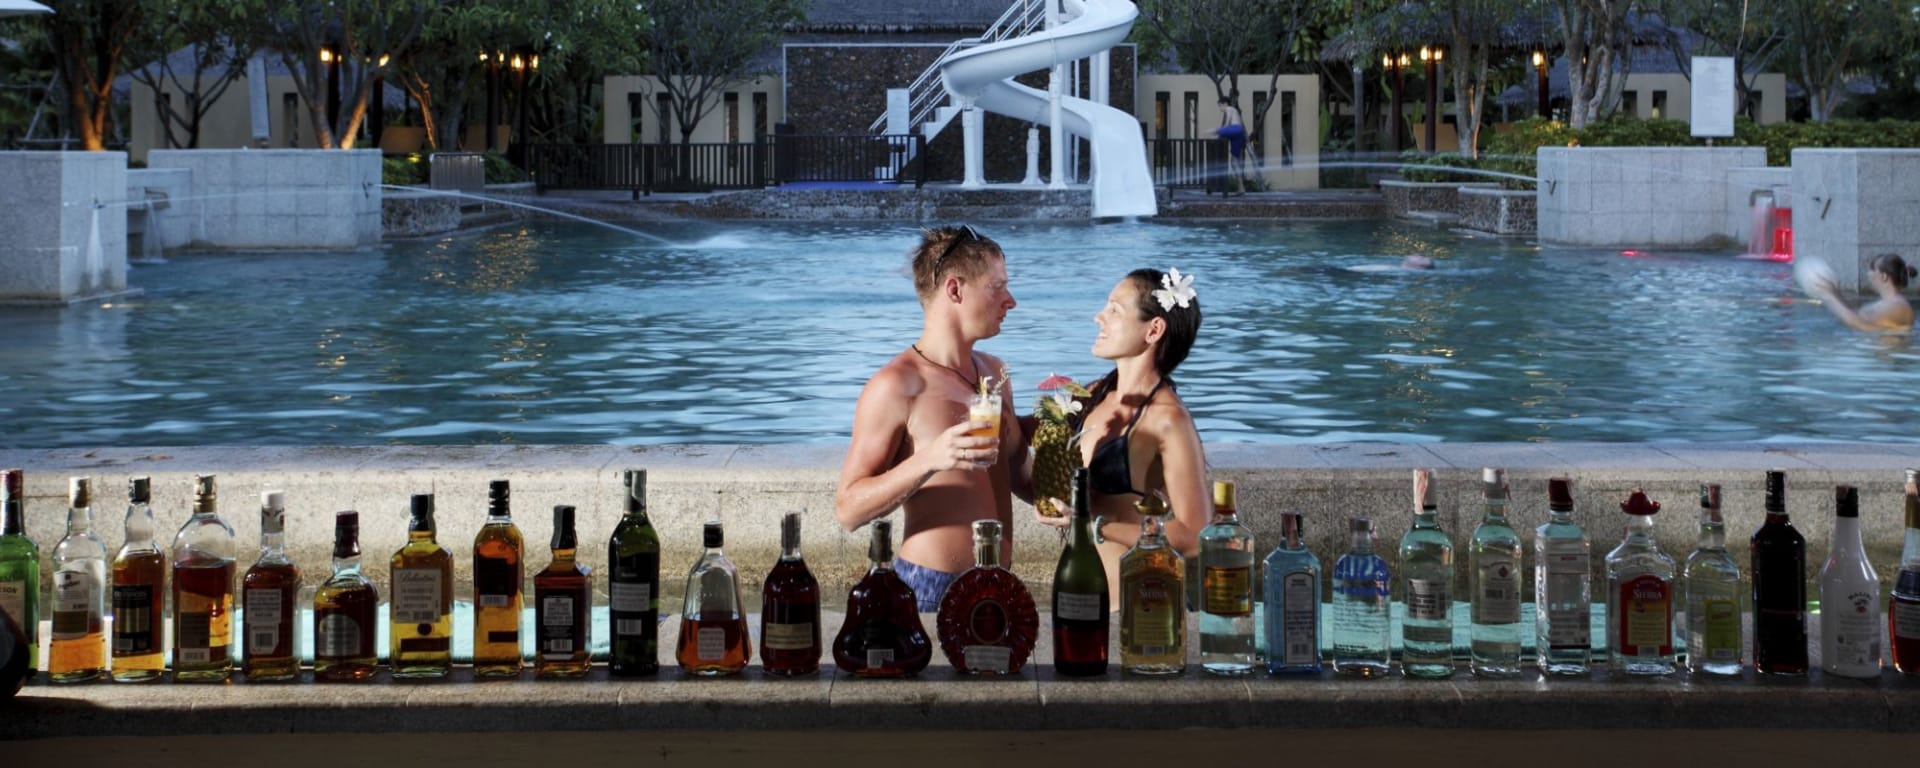 Centara Koh Chang Tropicana in Ko Chang: Splash Pool Bar